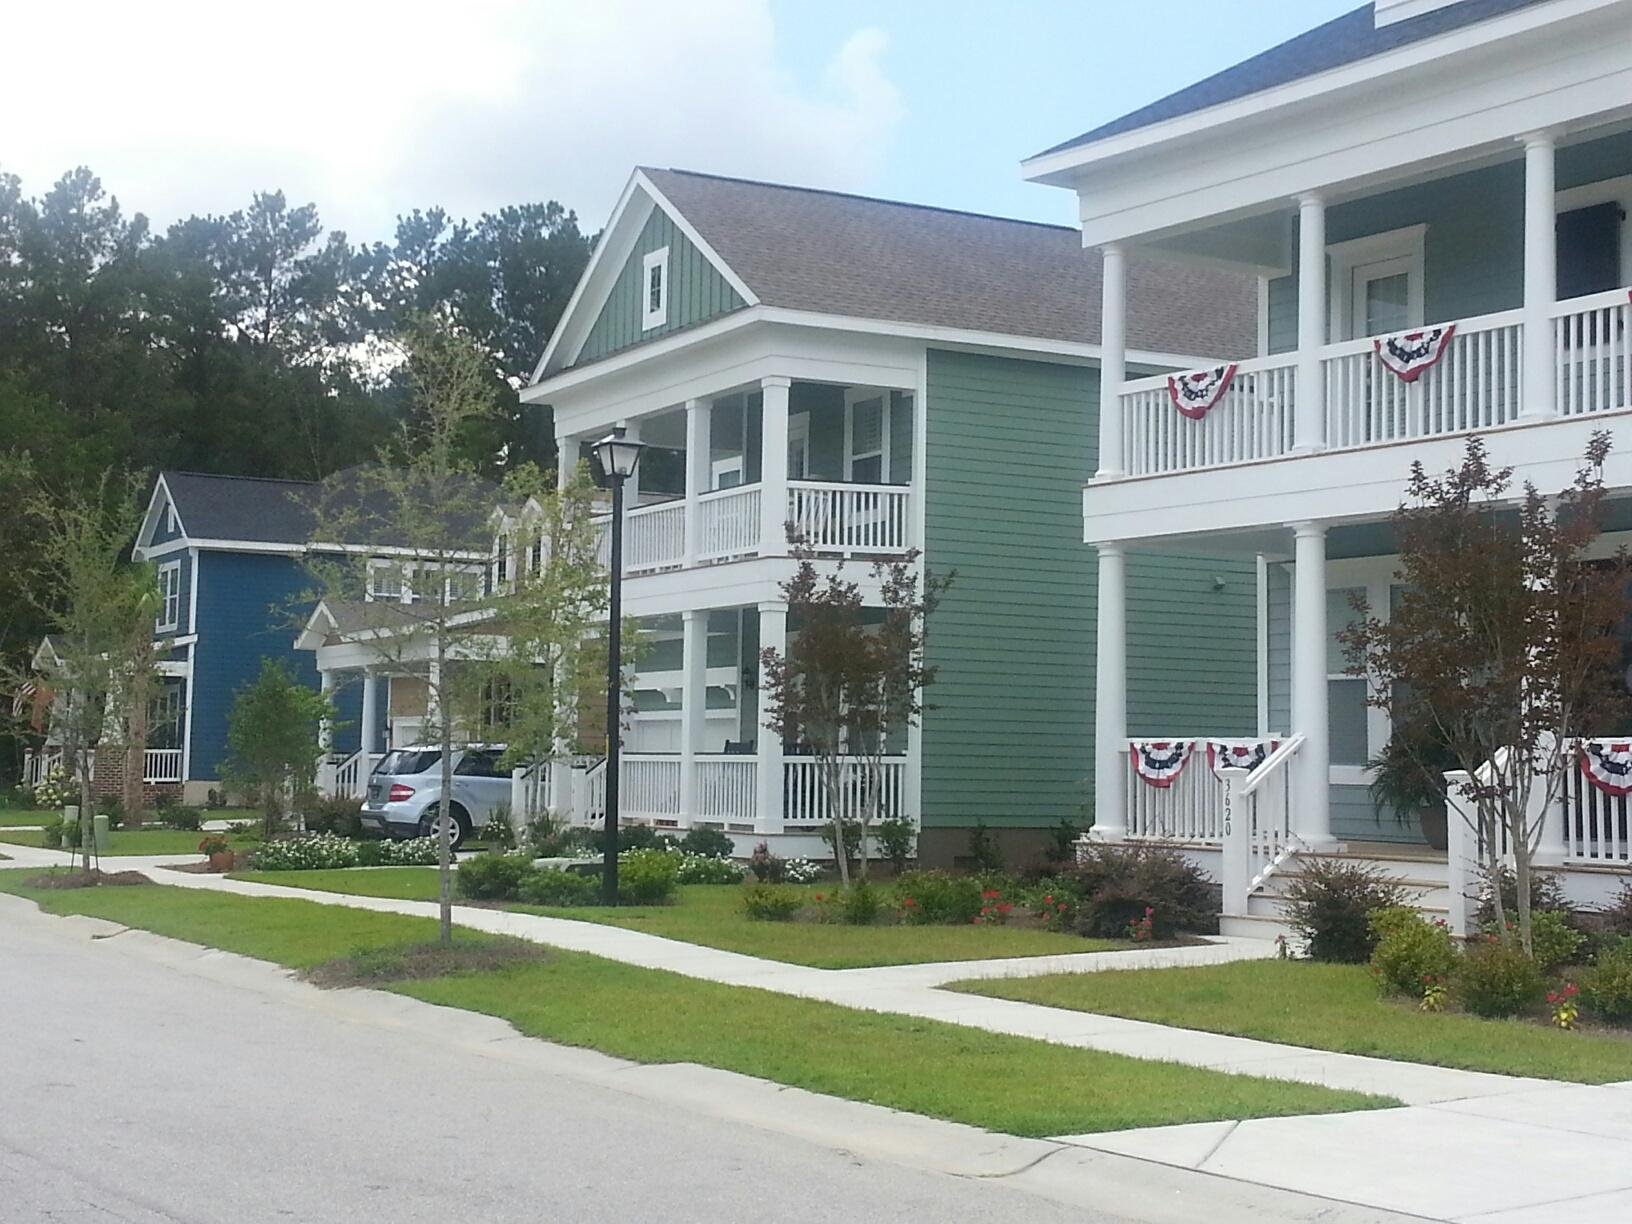 Carolina Park Homes For Sale - 1583 Old Rivers Gate, Mount Pleasant, SC - 39